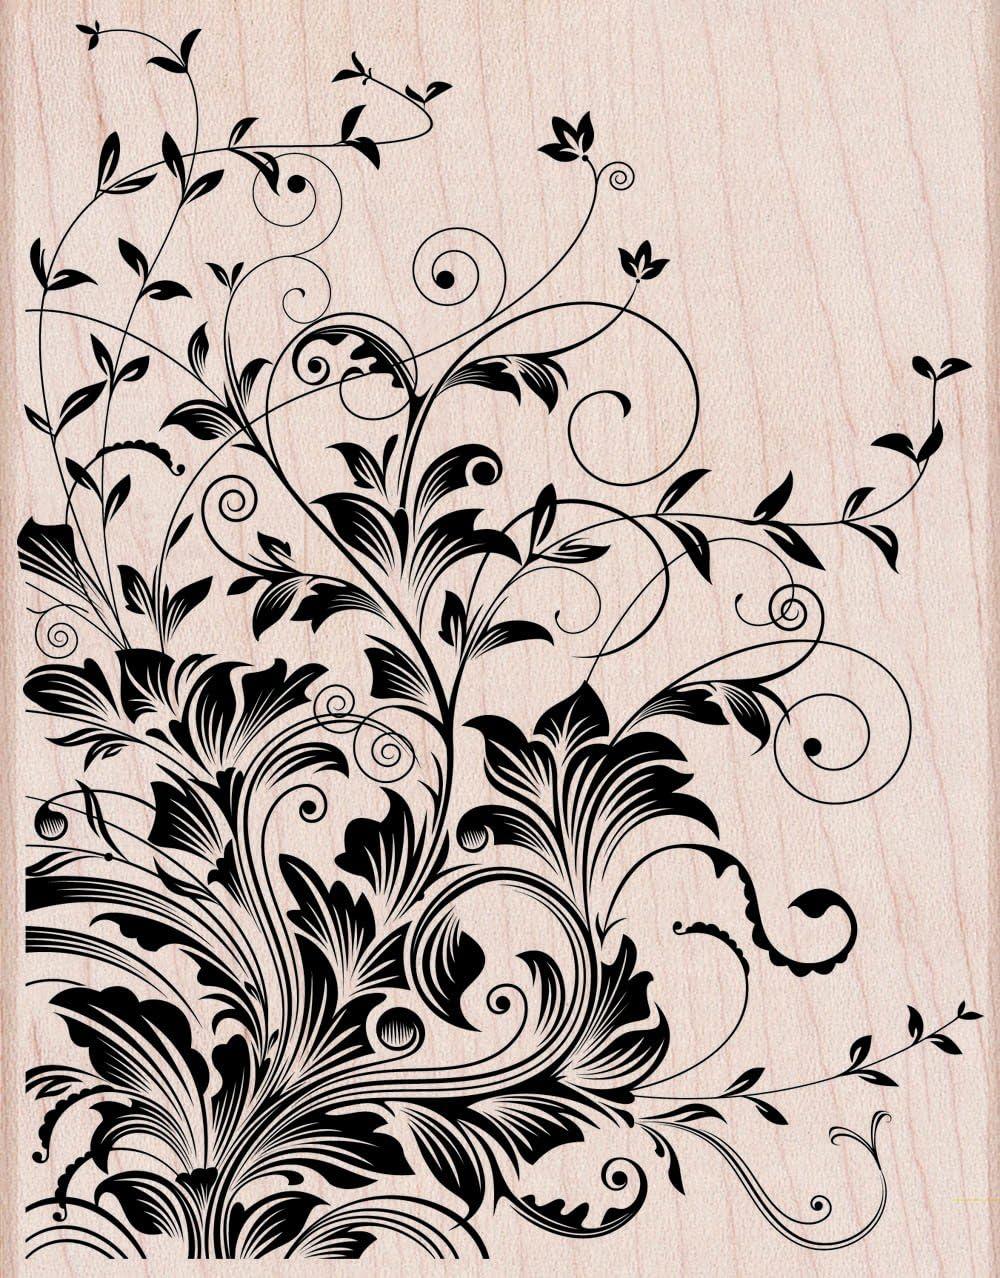 Hero Arts Leafy Vines Woodblock Decorative Stamp